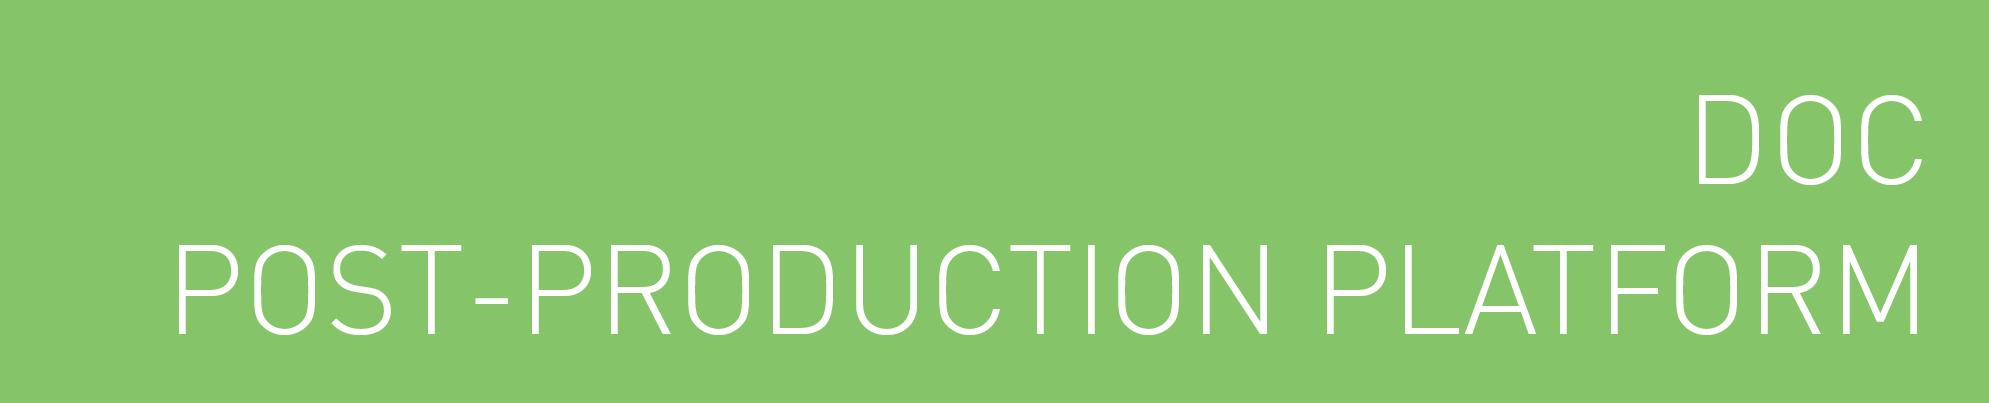 docbutton-01